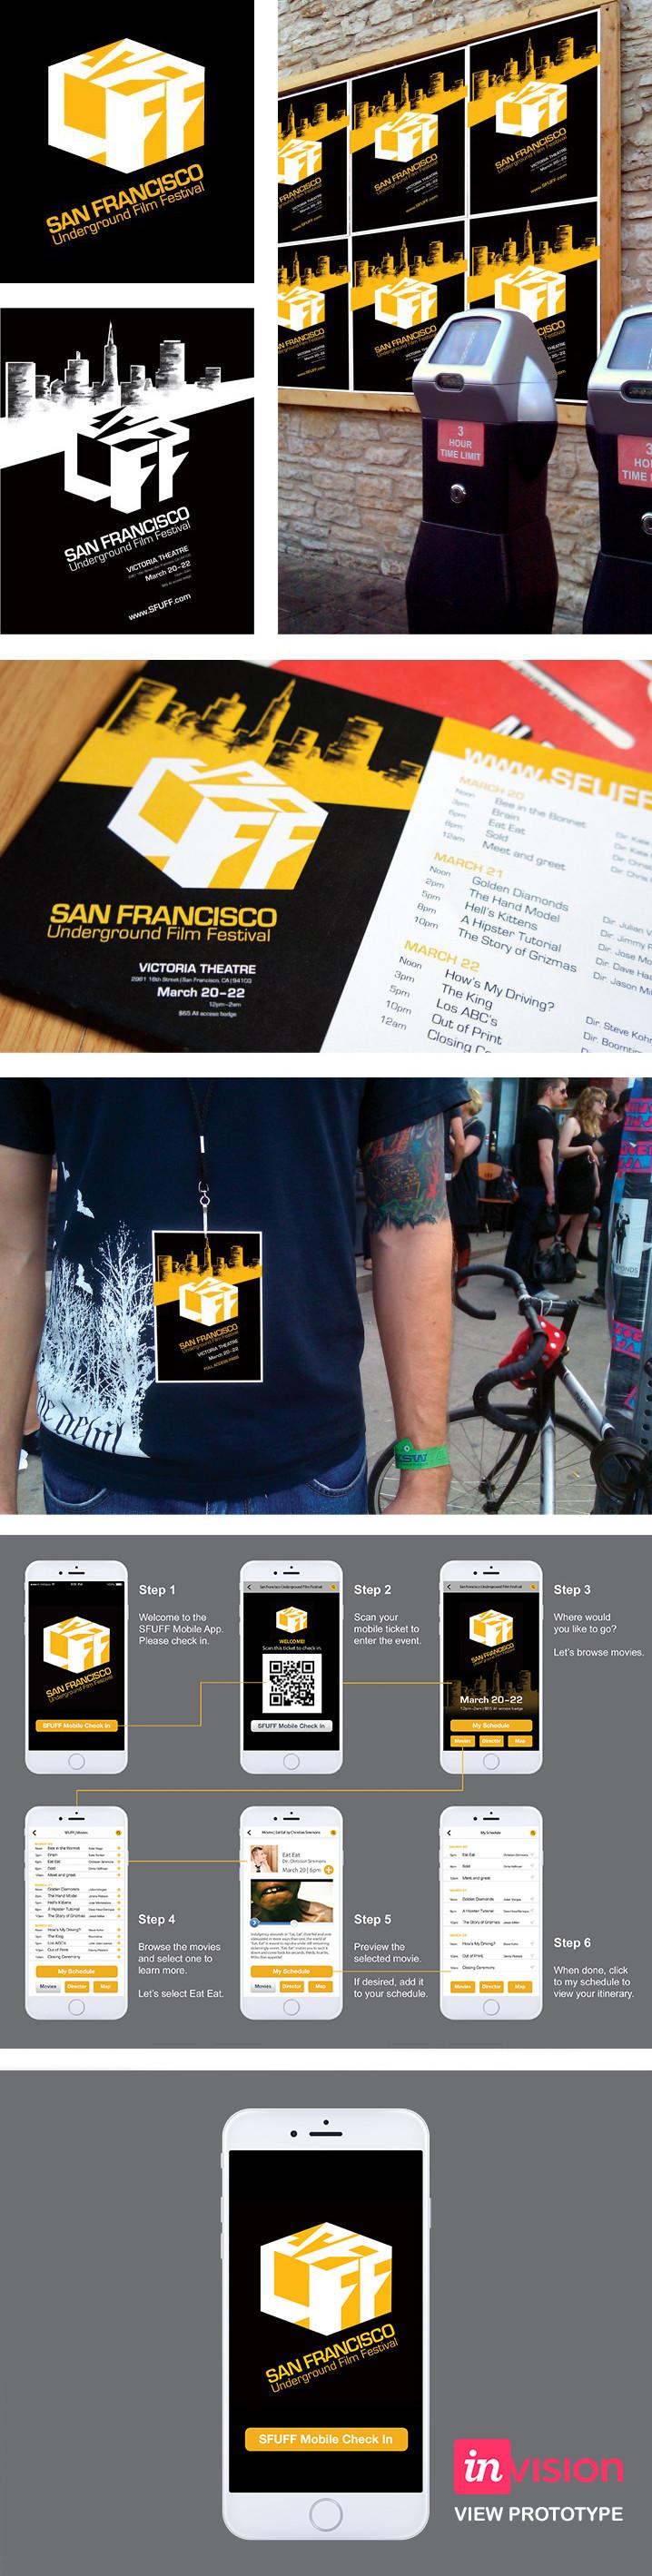 sfuff-visual-design-ui-branding-jenniferalt